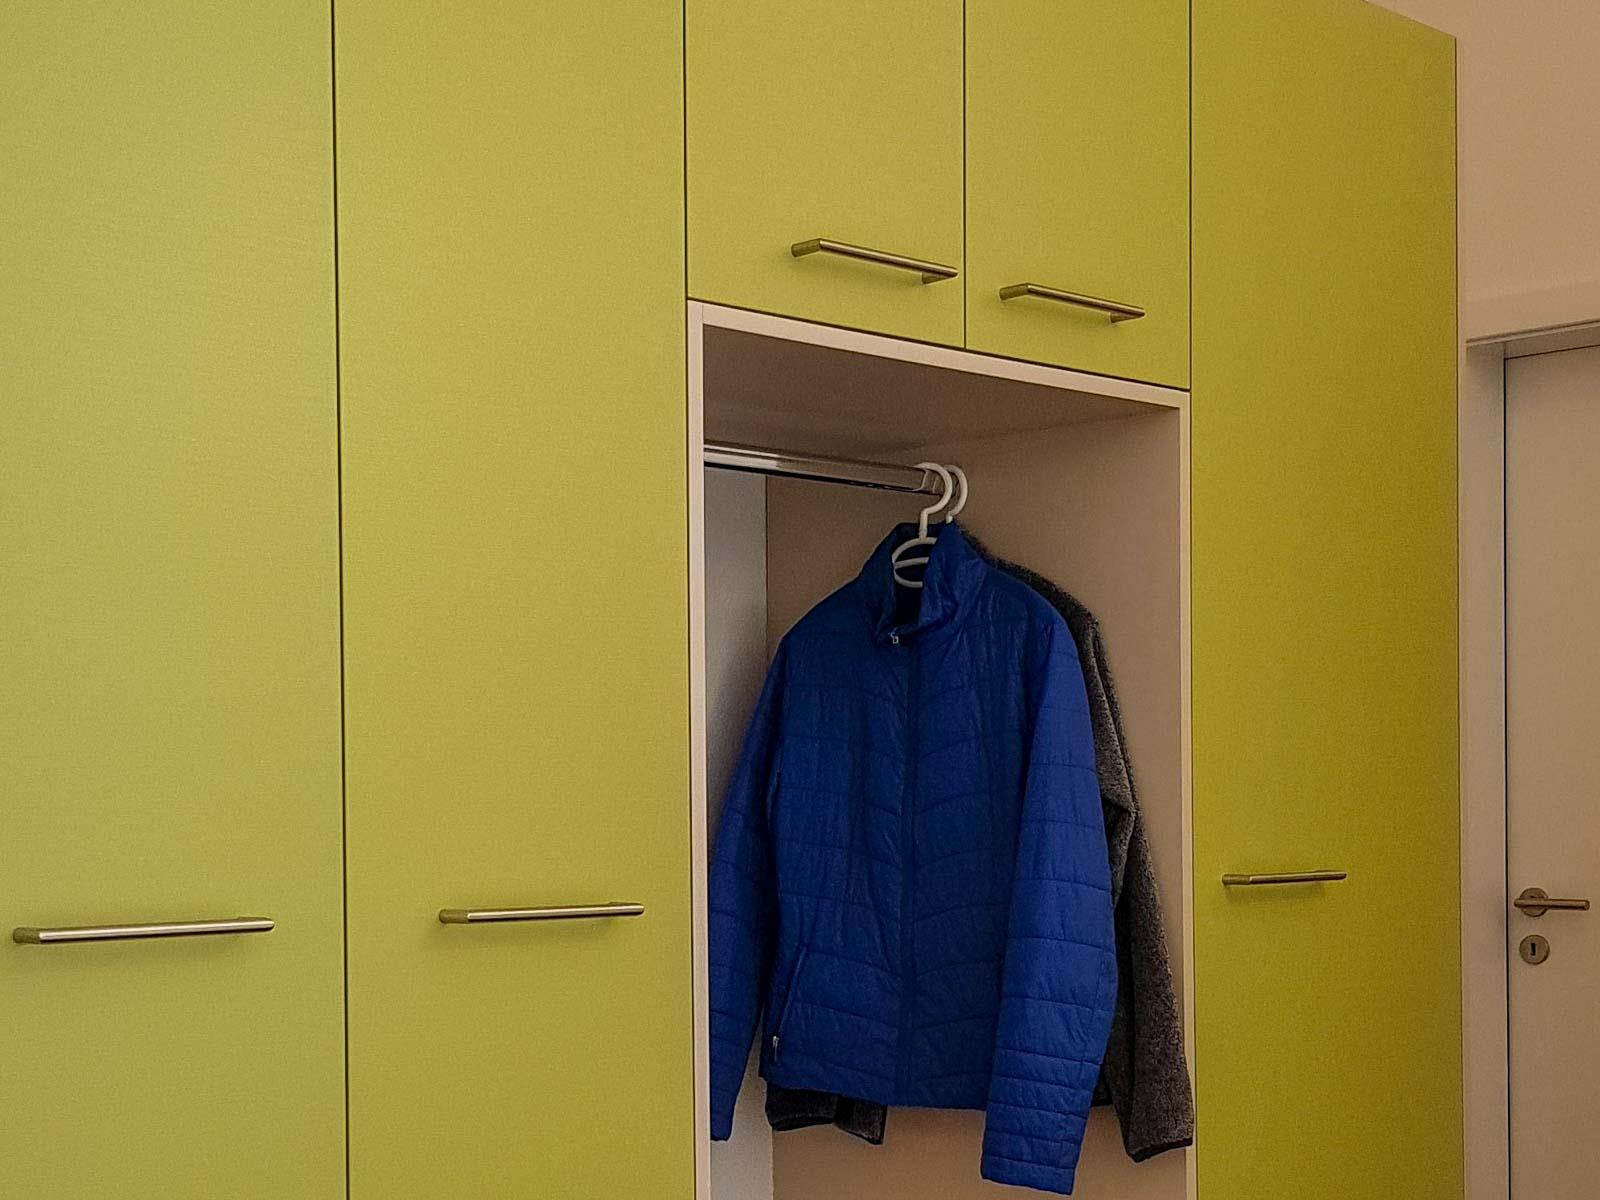 Wooddesign_Garderobe_Gästegarderobe_grün_beige_offene Gästegarderobe_Putzschrank (1)